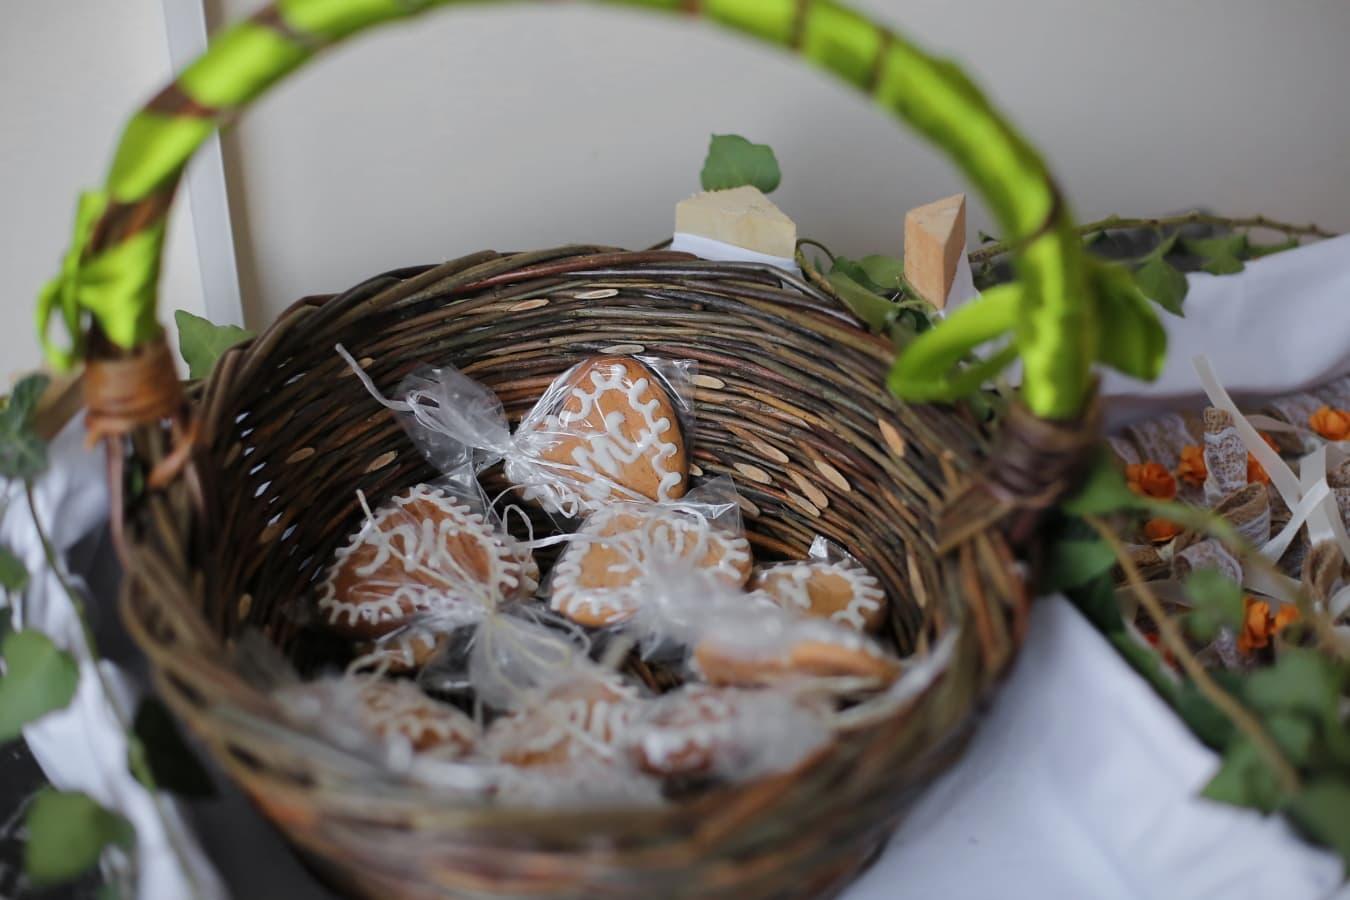 cookies, gingerbread, baked goods, handmade, wicker basket, basket, traditional, food, ingredients, delicious